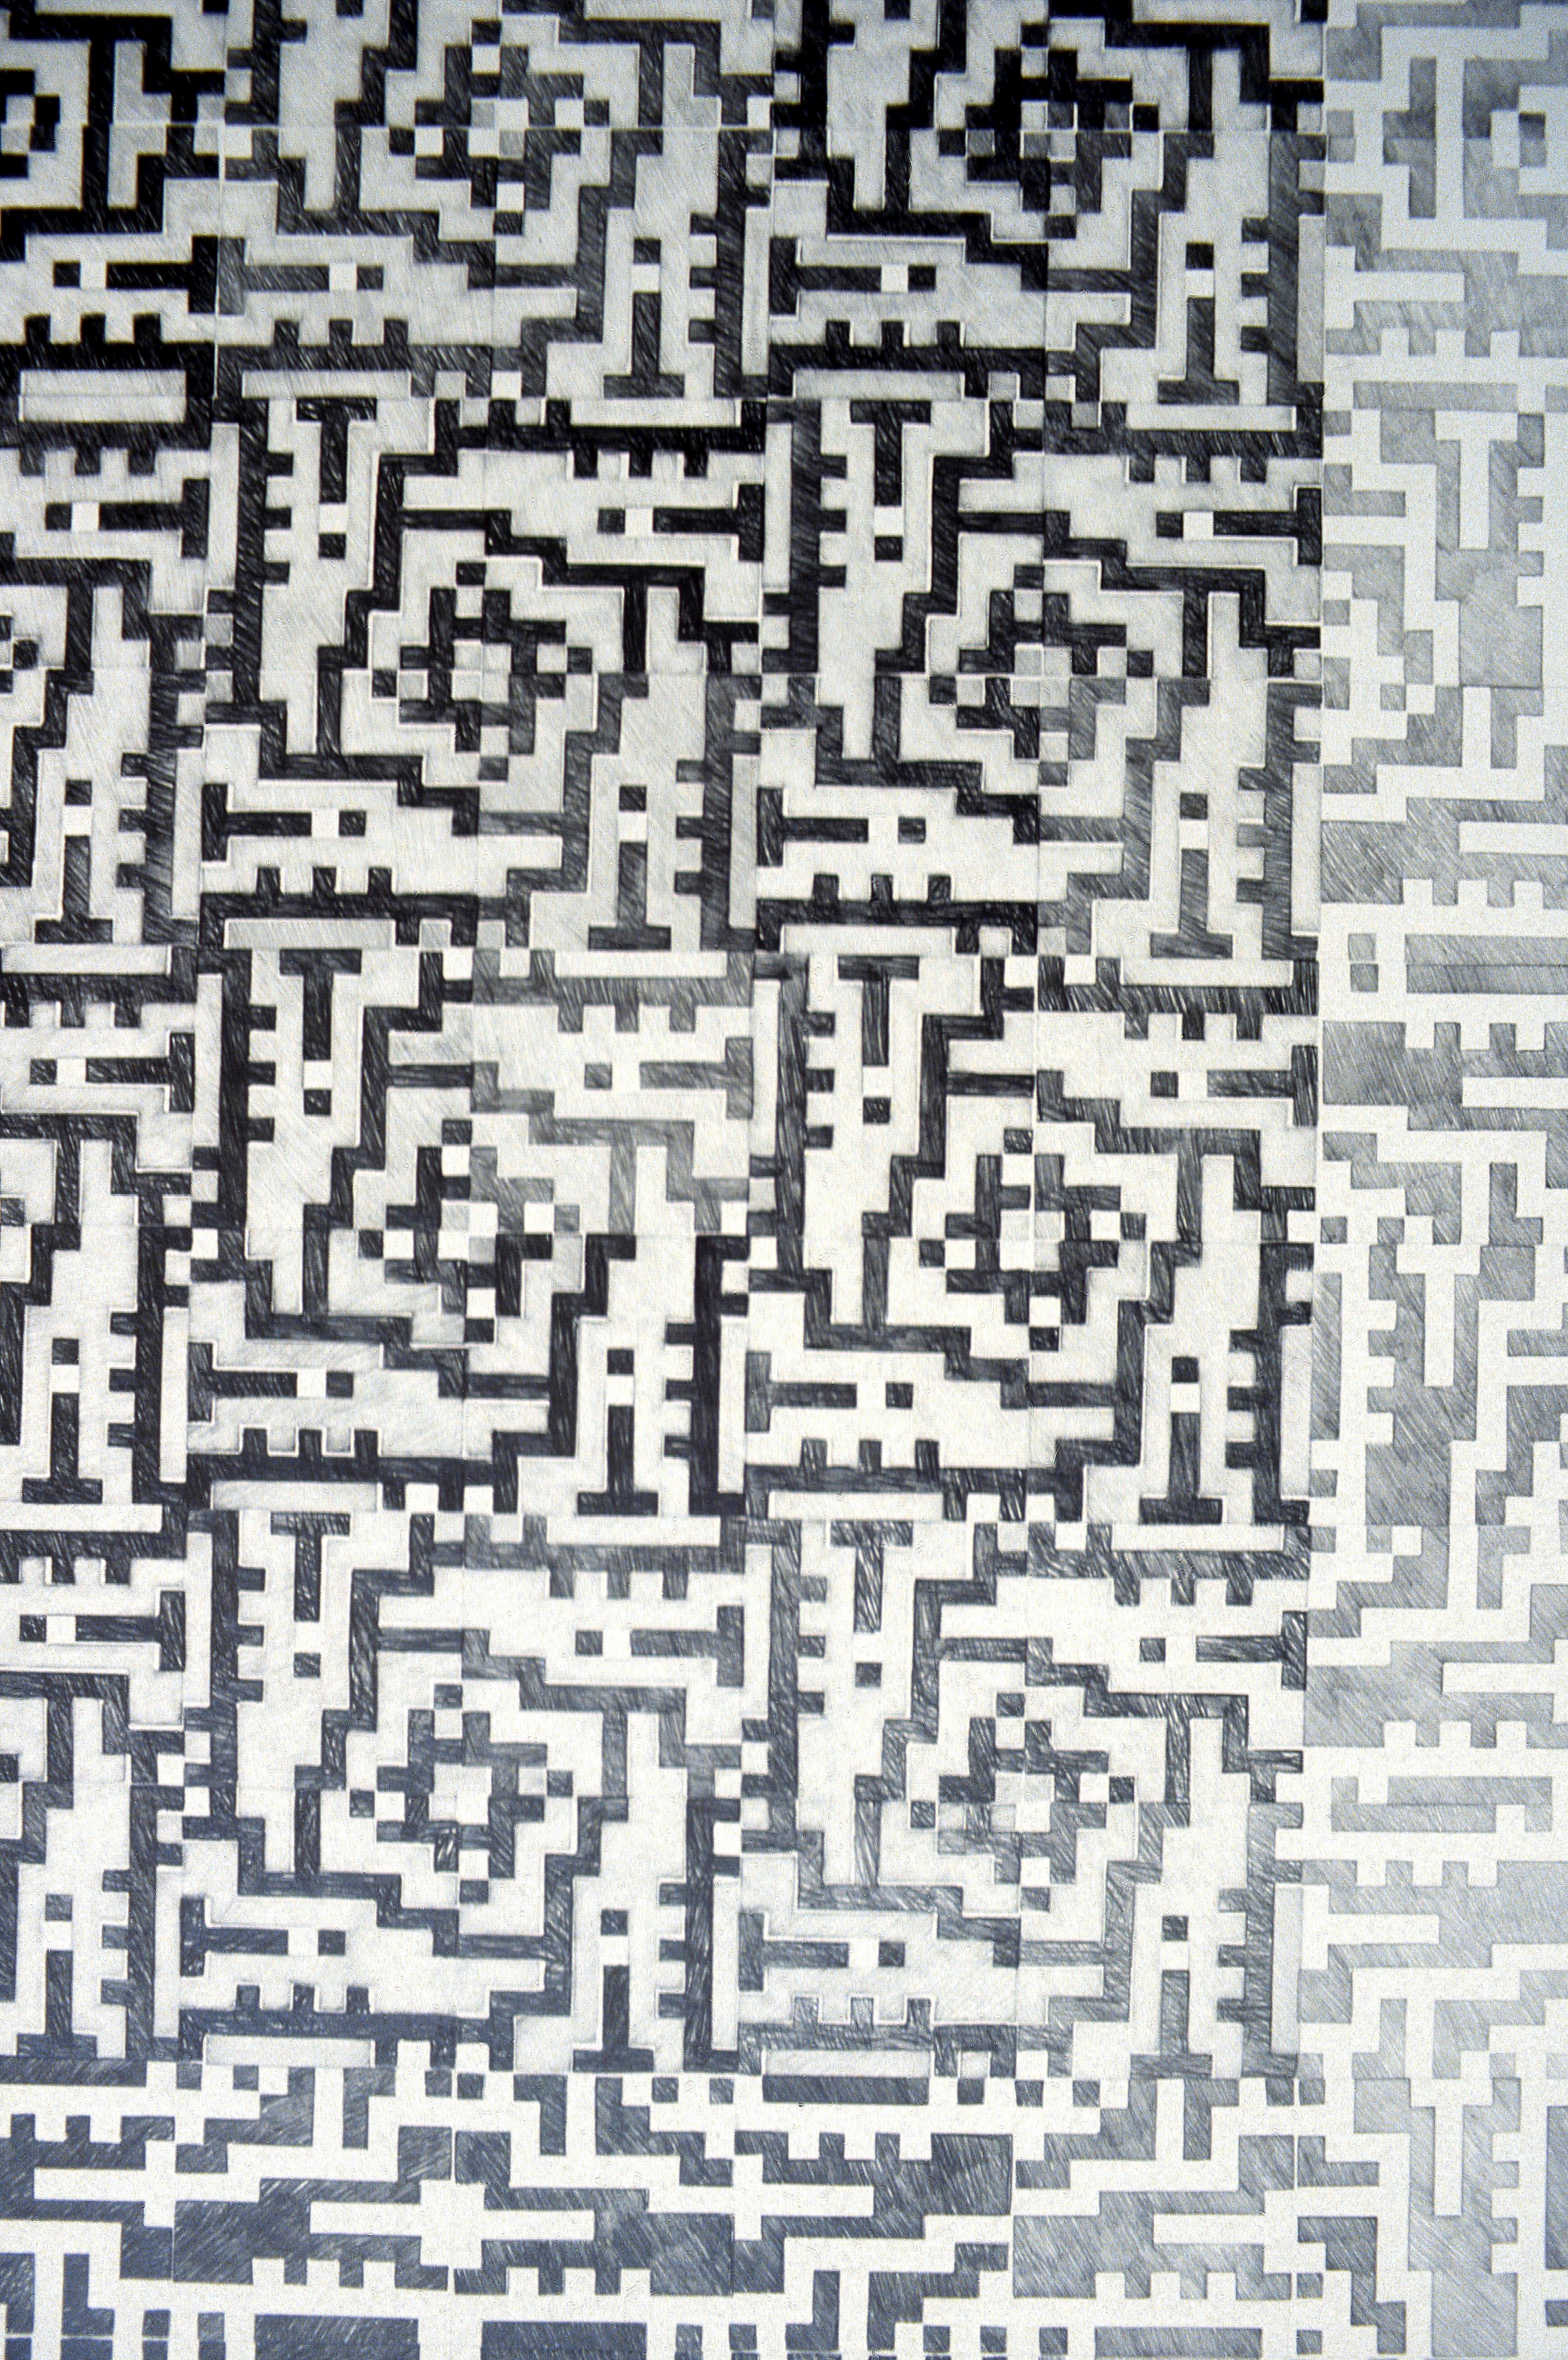 adj 2-56 153257-HRSL-Box 2-056 detail